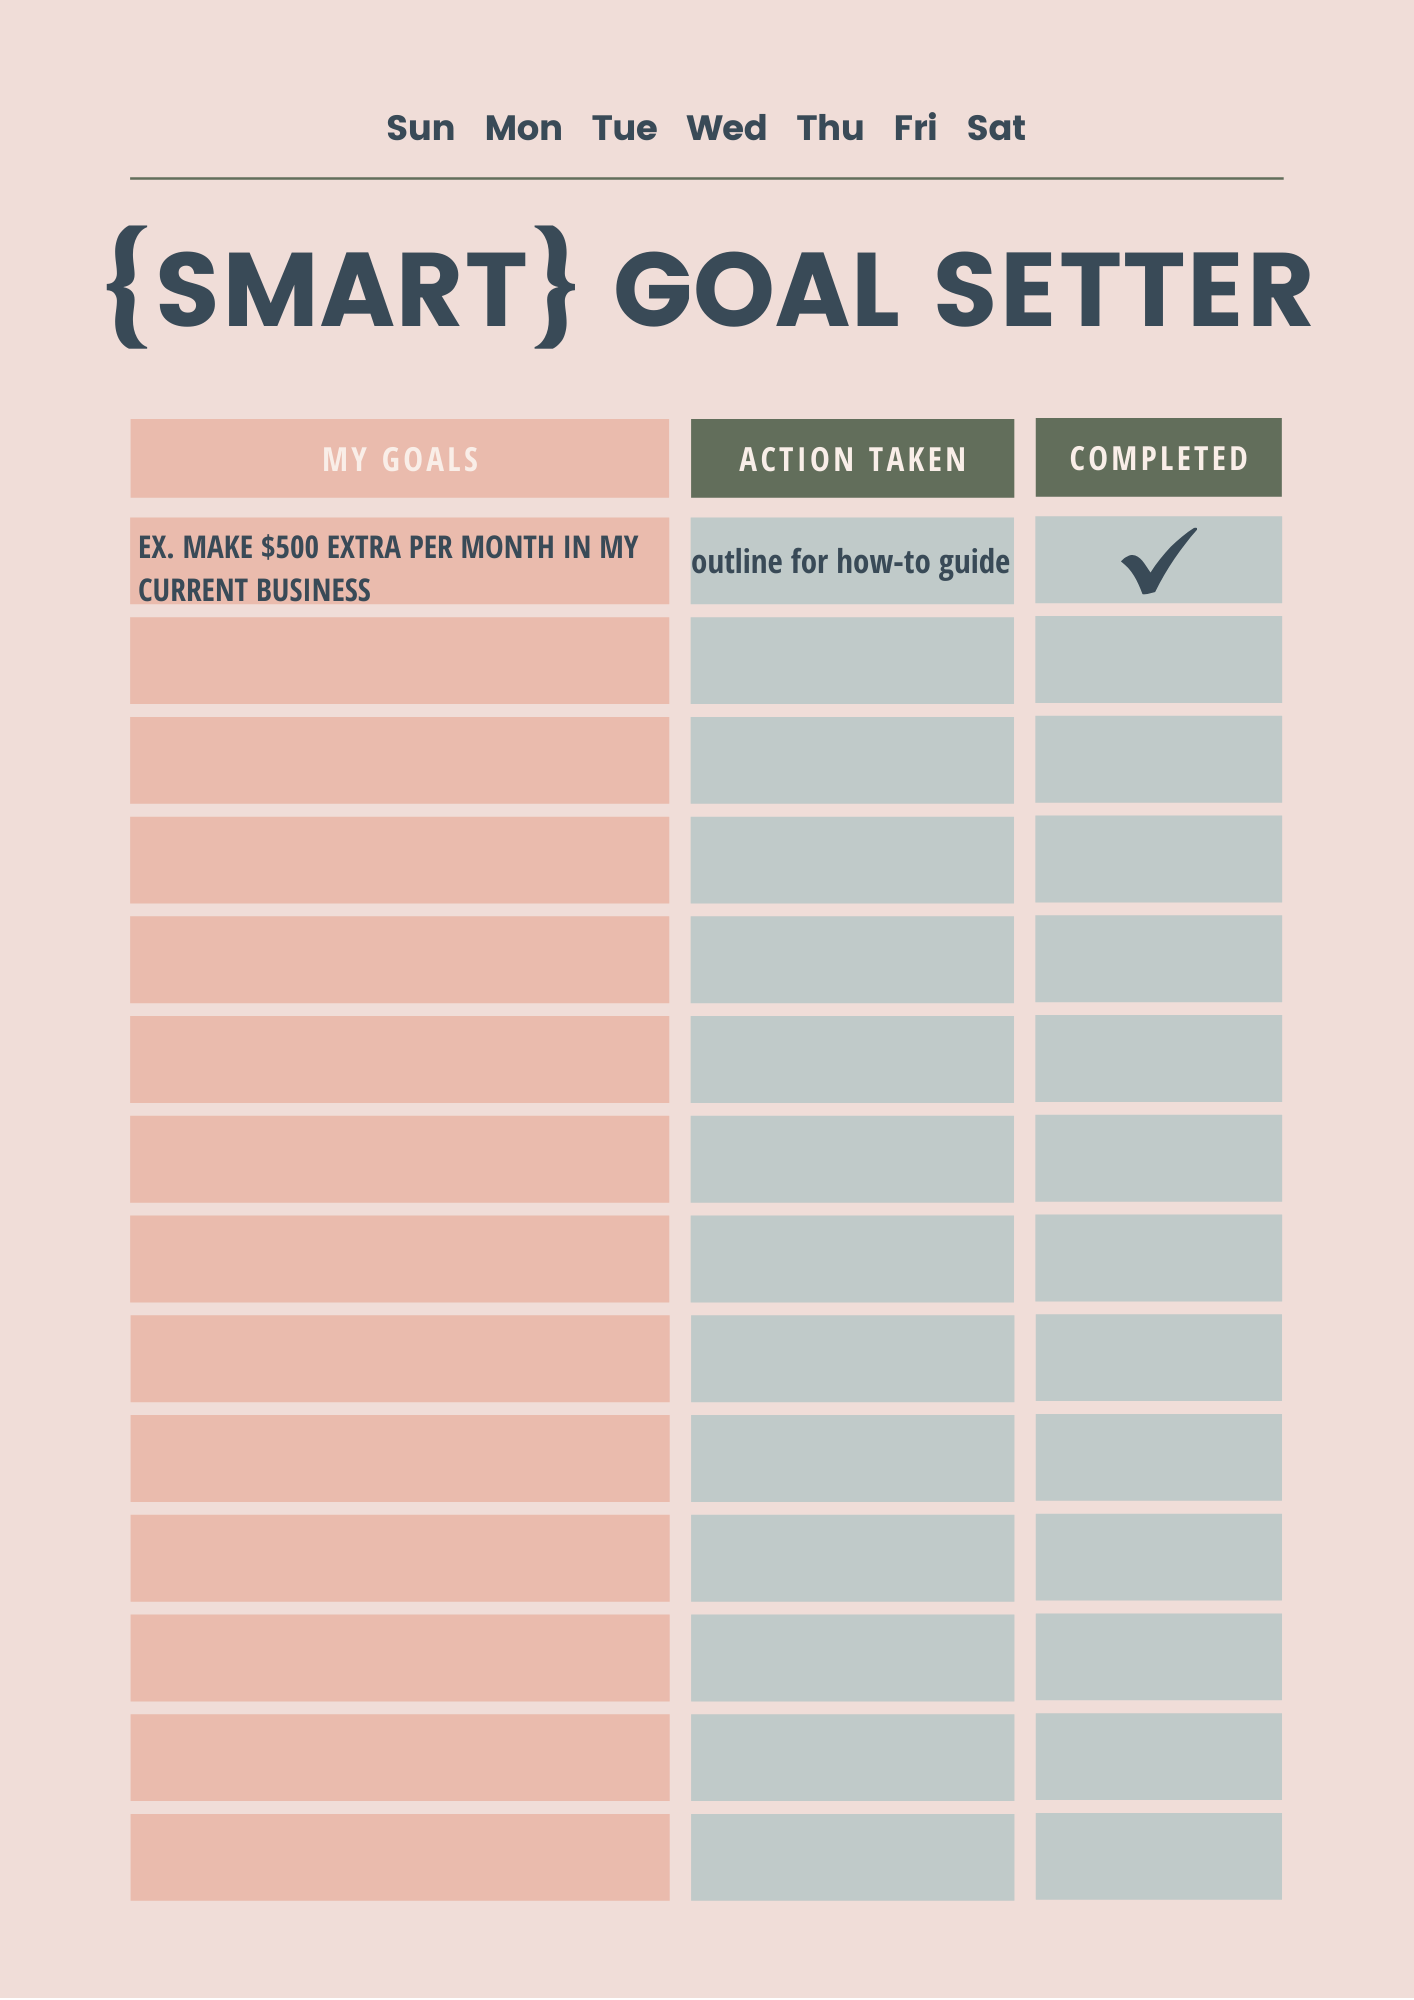 Smart Goals Template creativebiztribe.com #smartgoal #smartgoals #goals setting a goal